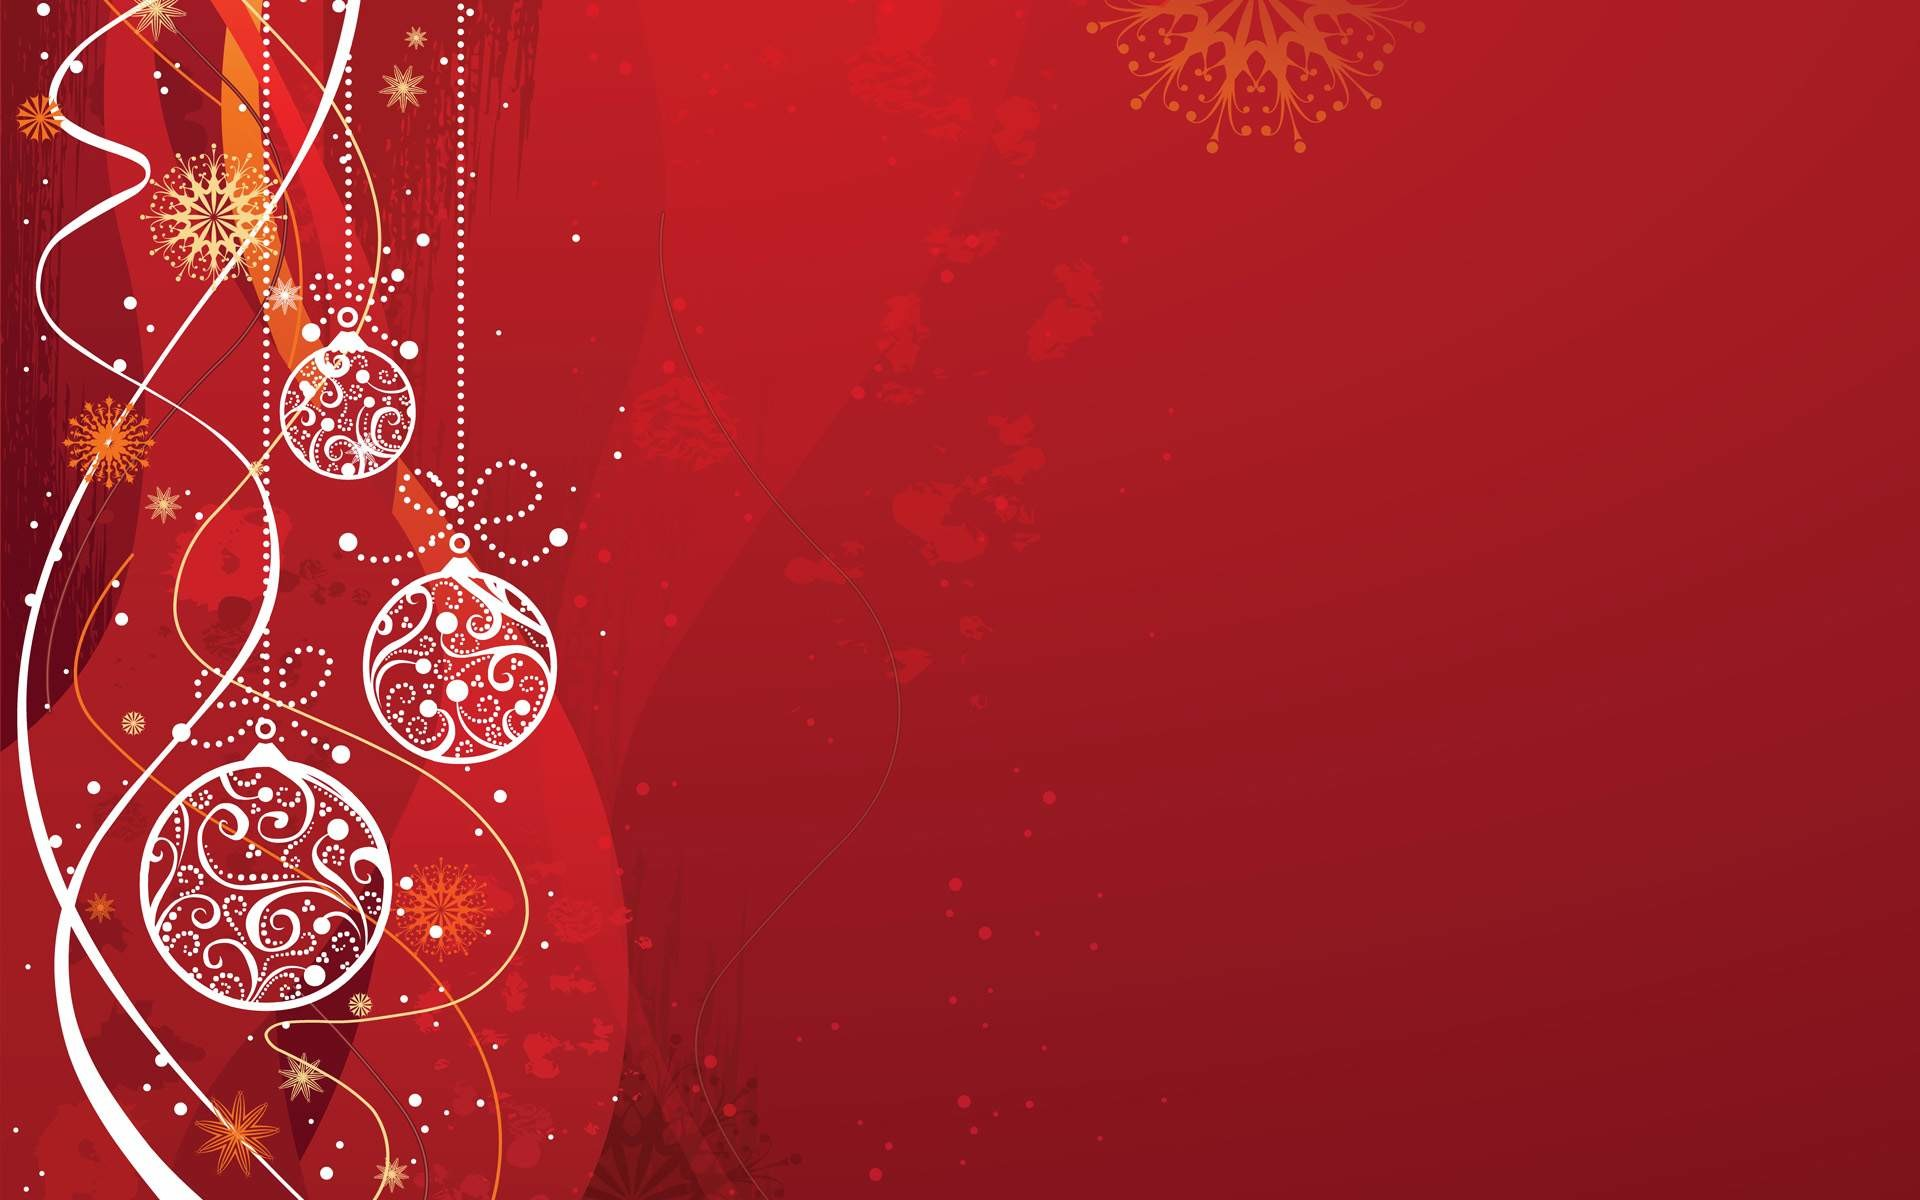 free christmas background clipart | christmas wallpapers for vista ,  wallpaper, desktop, backgrounds .